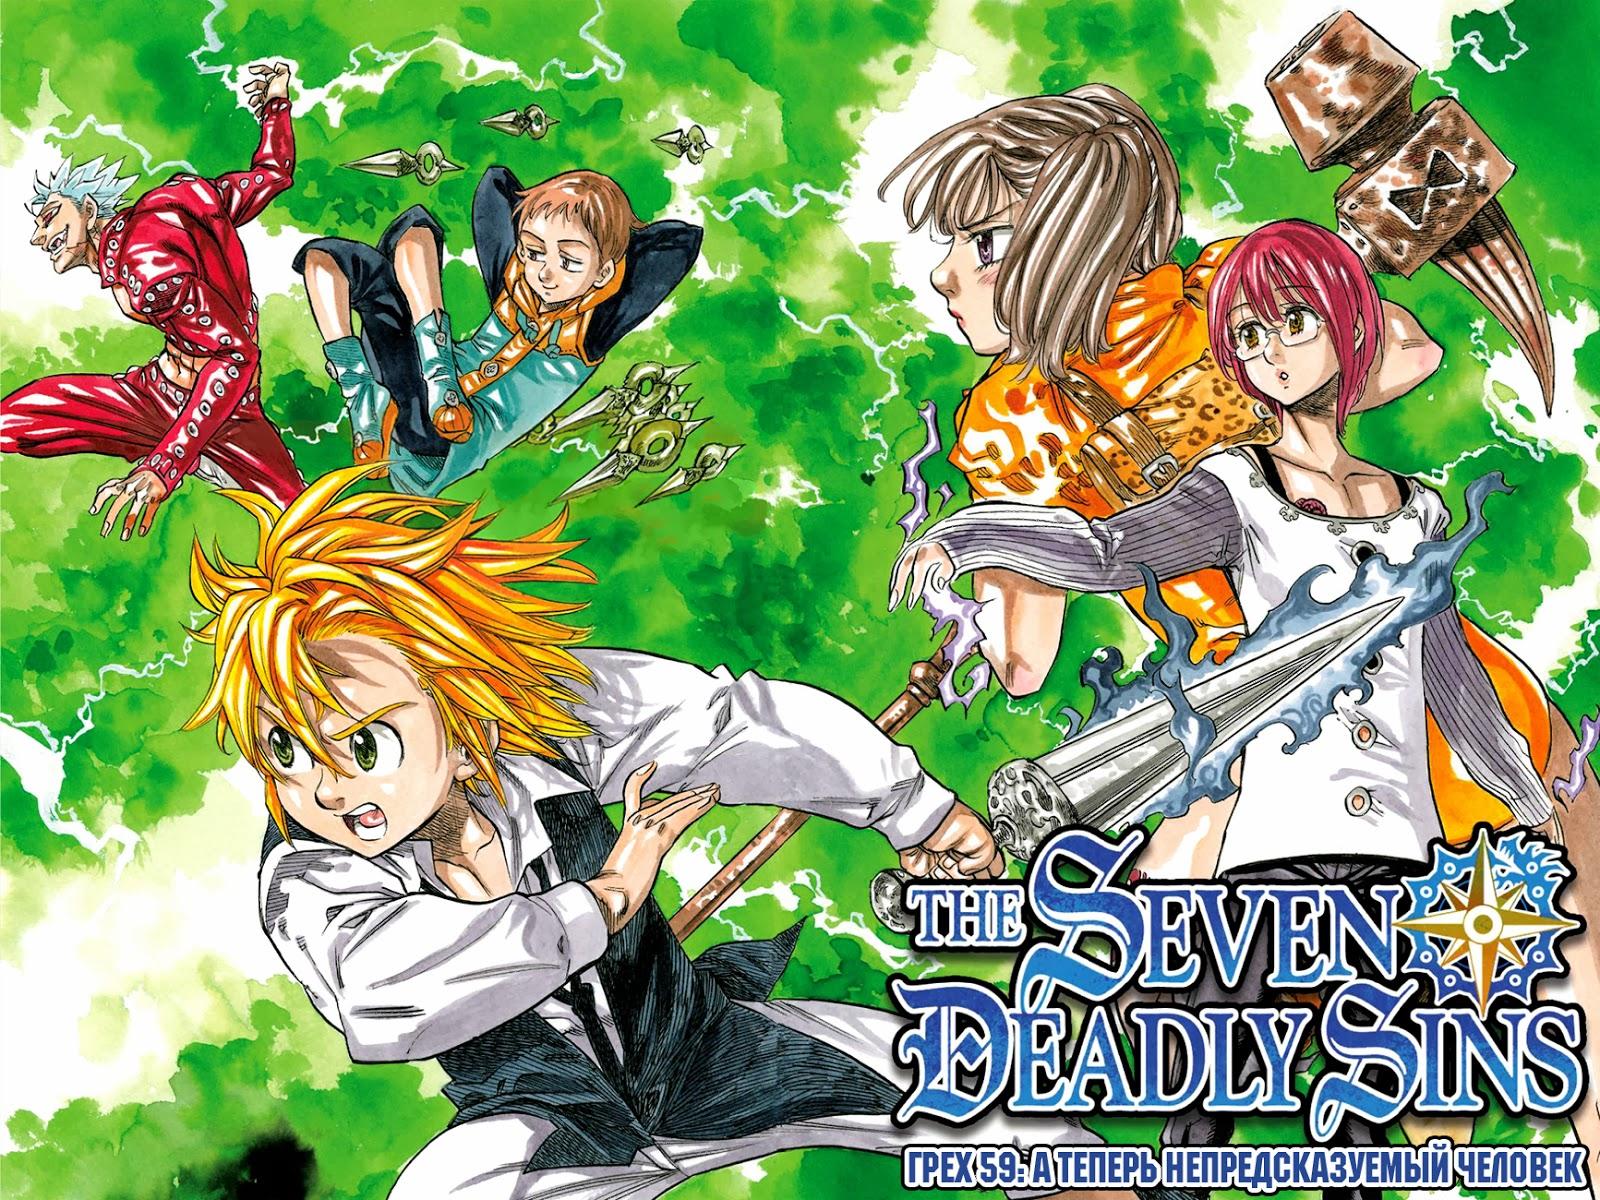 Anime 7 Deadly Sins